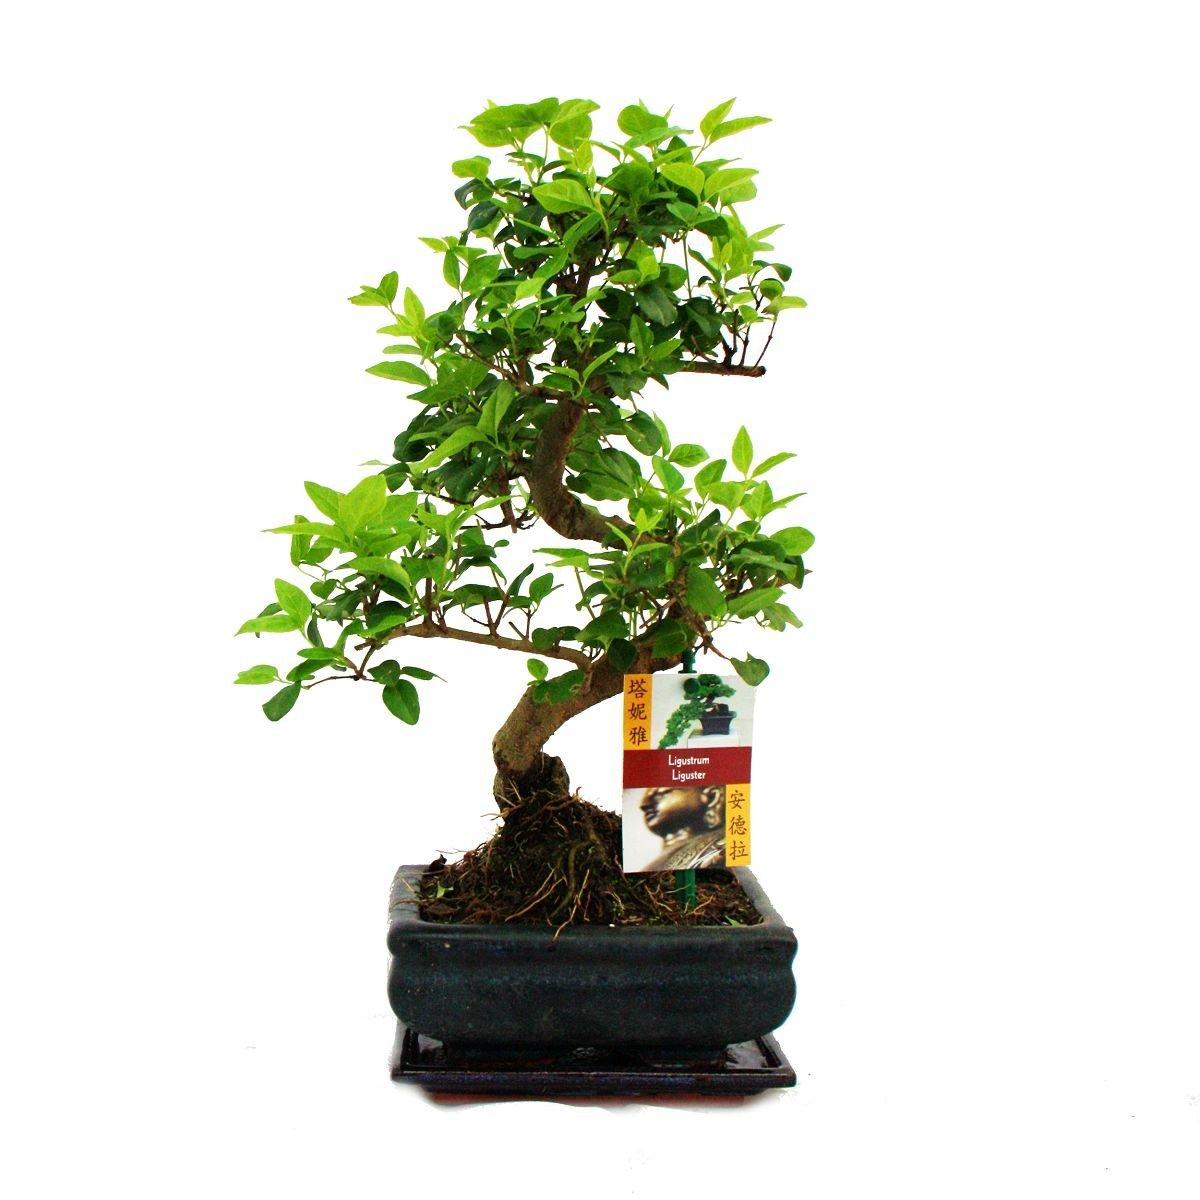 liguster bonsai baum bonsai baum. Black Bedroom Furniture Sets. Home Design Ideas